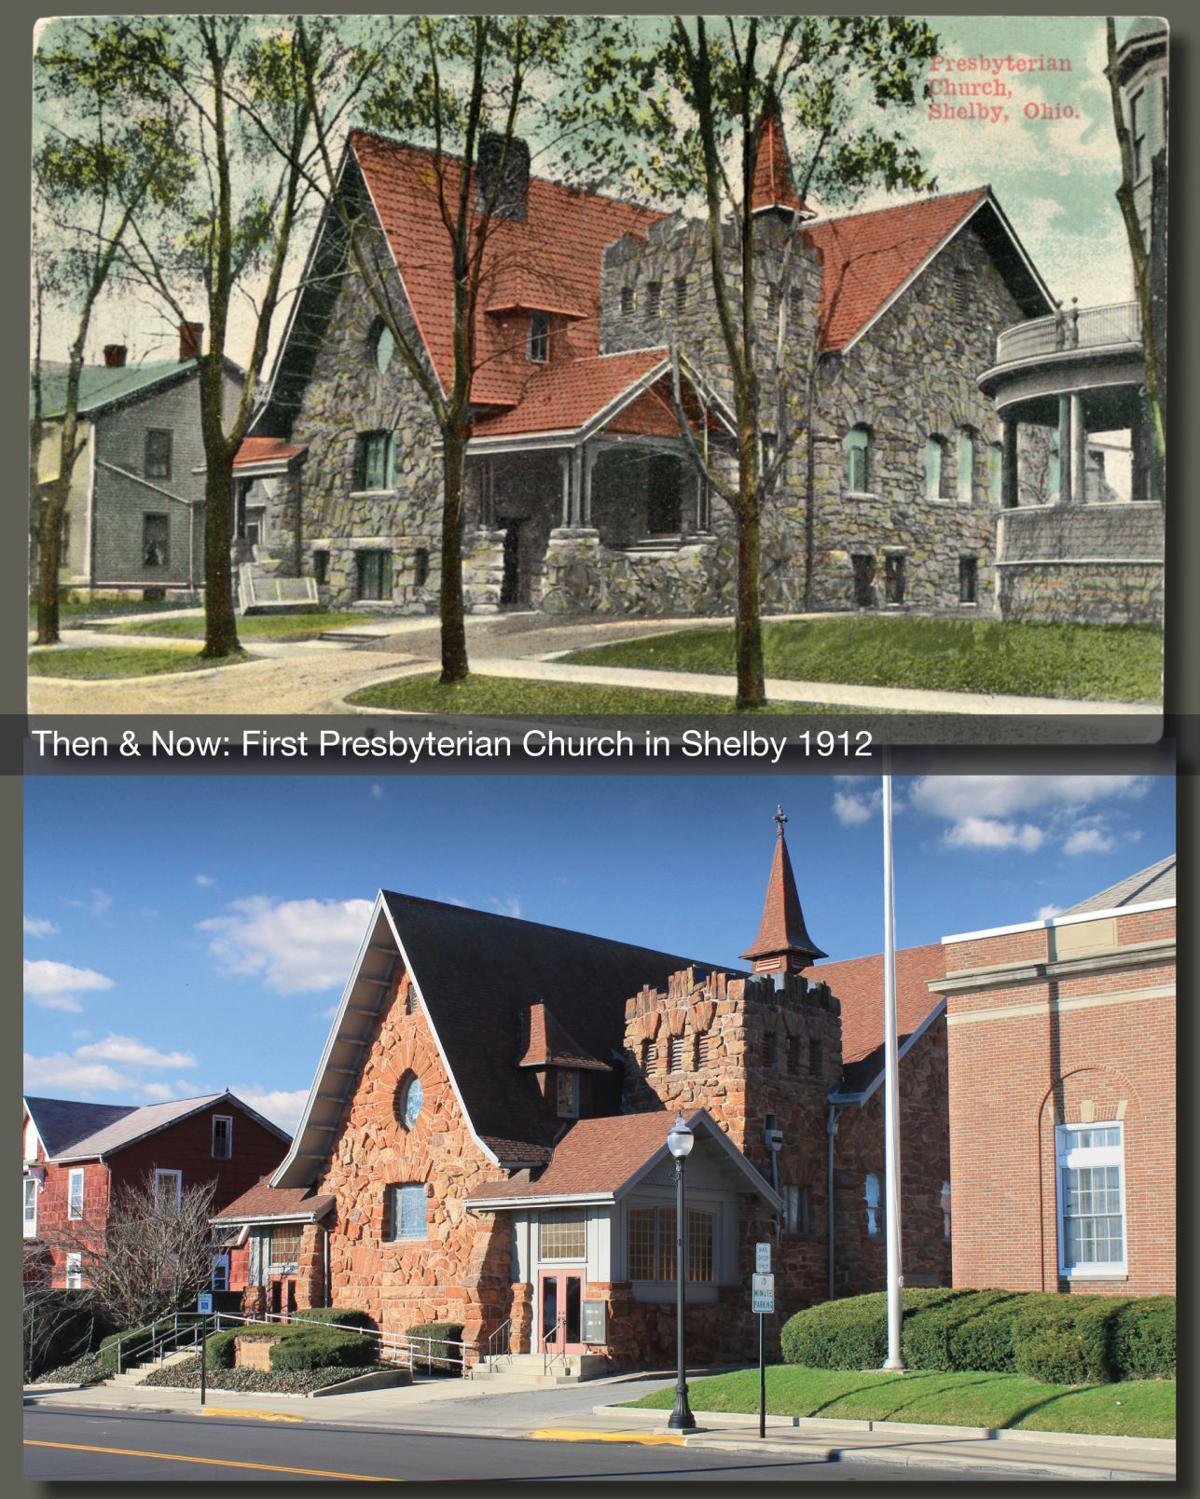 Then & Now: 1st Presbyterian 1912